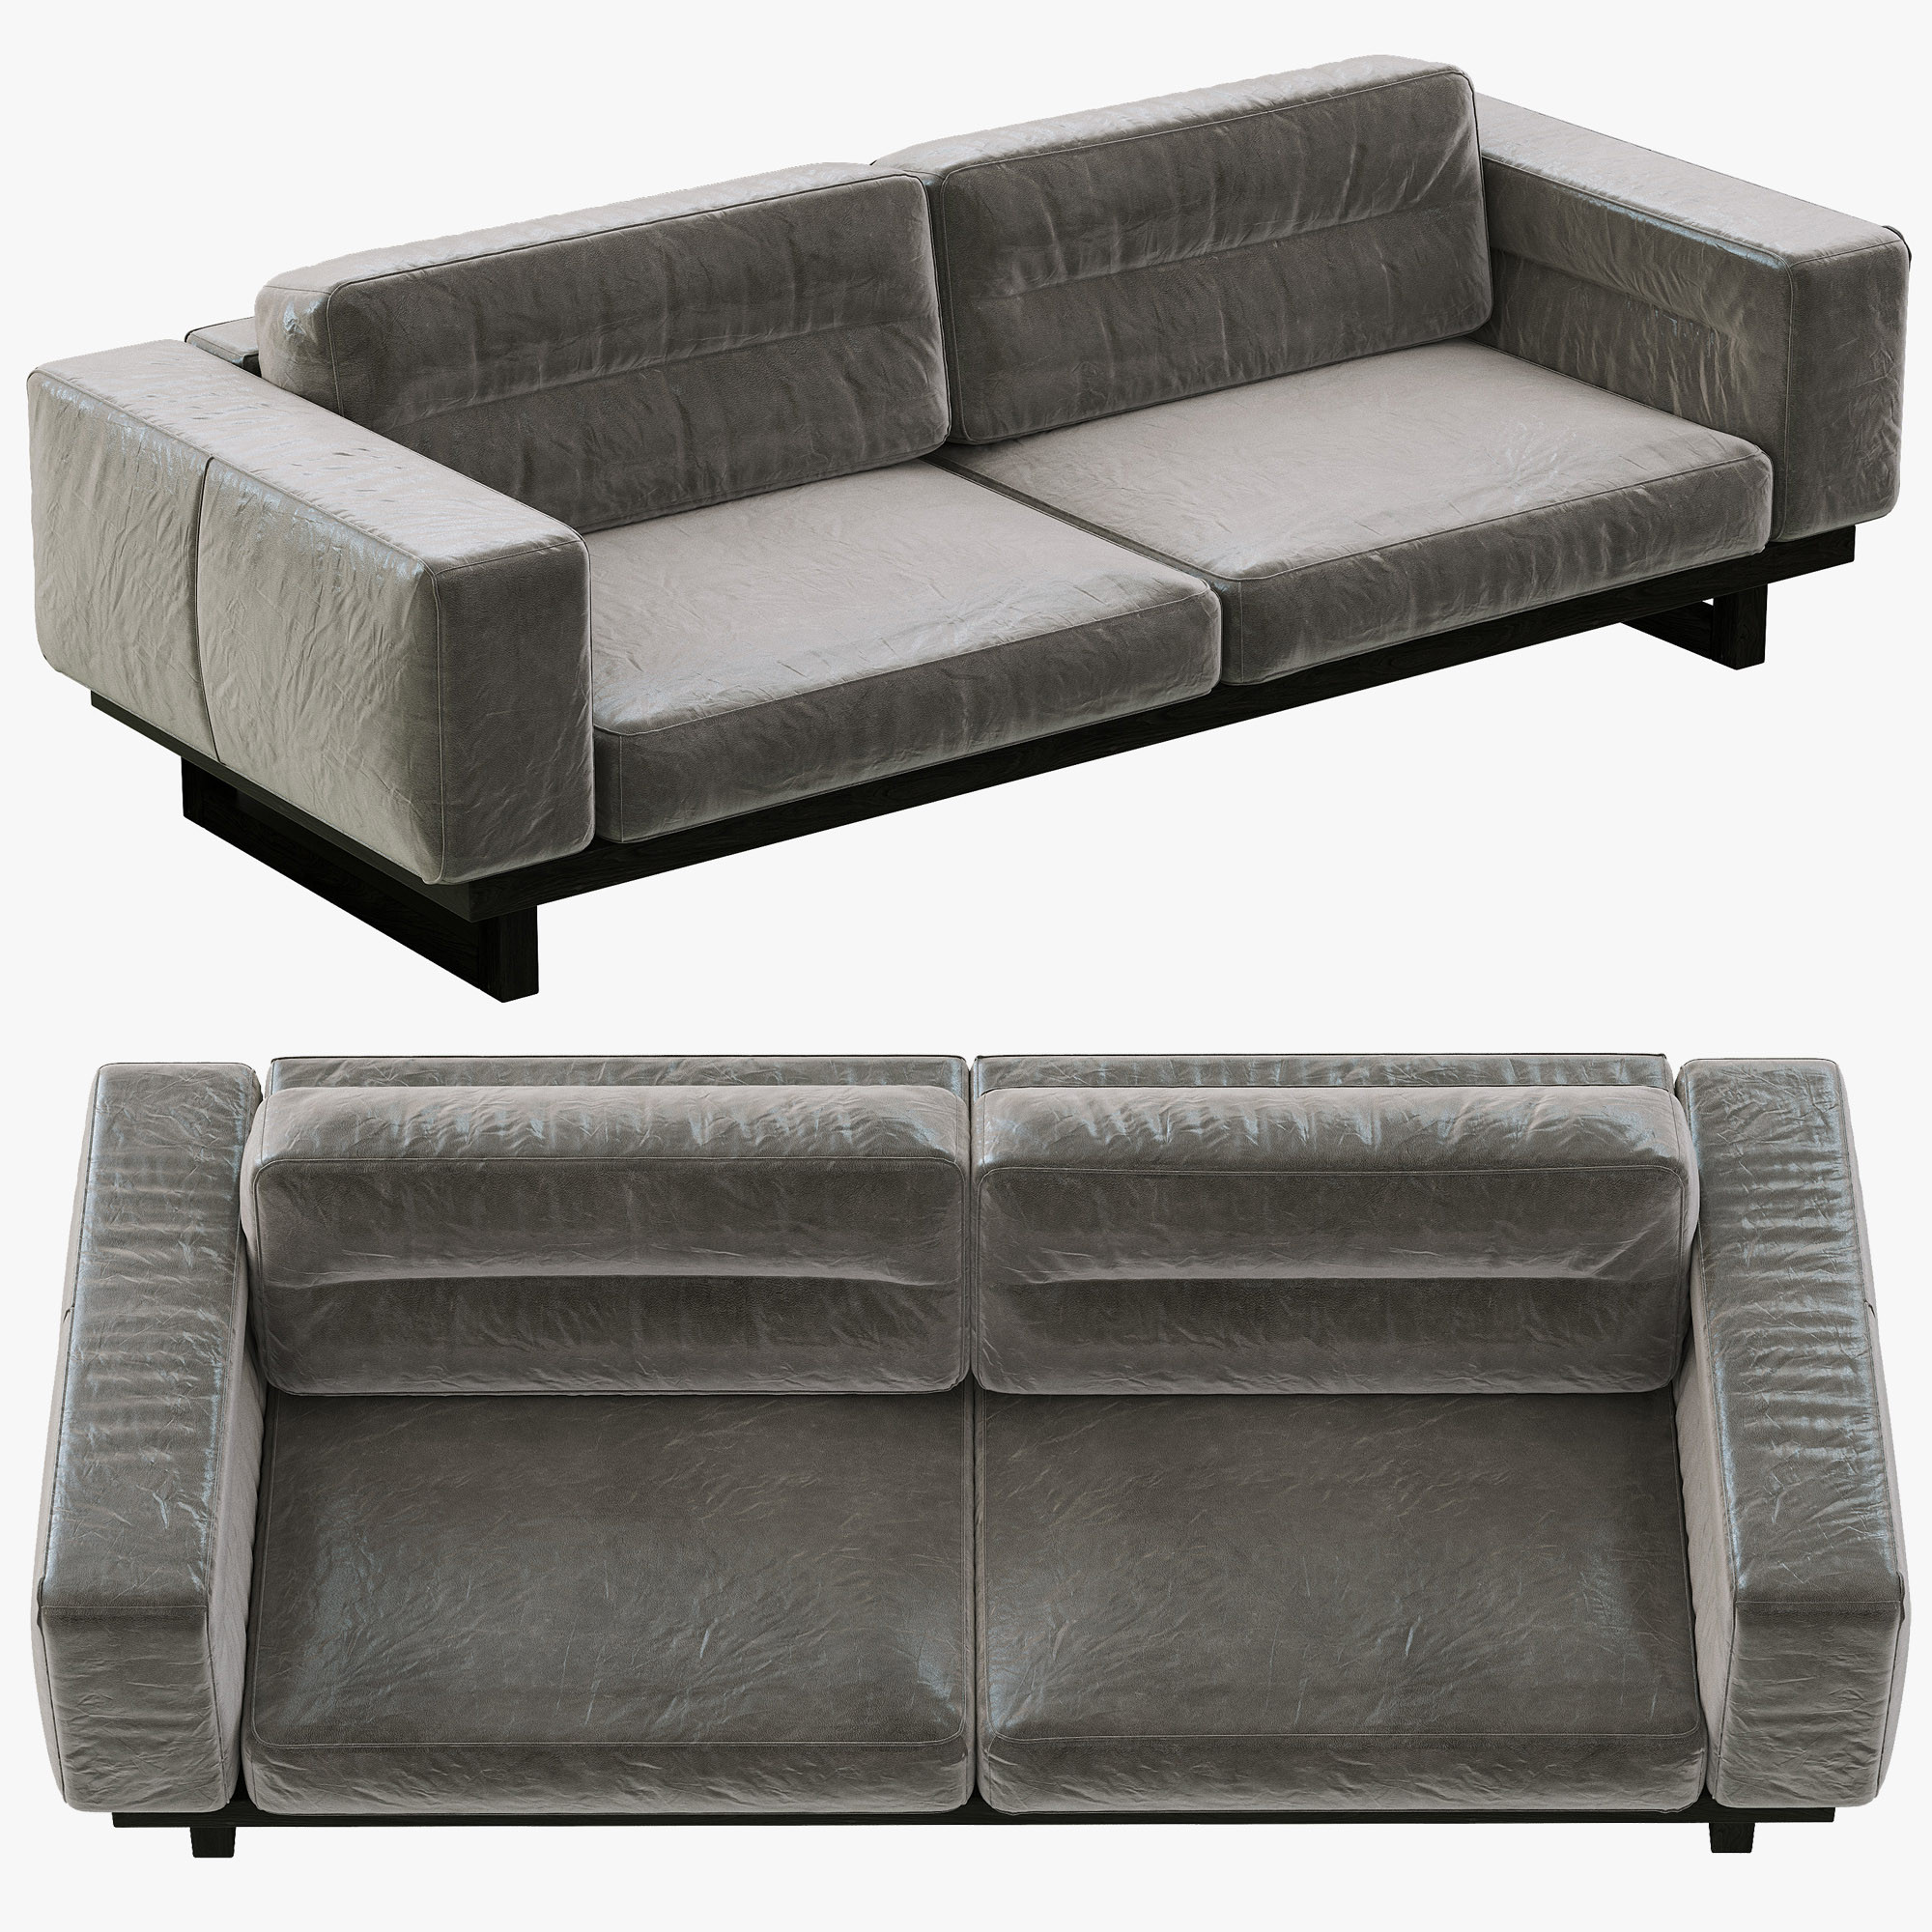 Leather Sofa Repair Rotherham: Restoration Hardware Durrell Leather Sofa 3d Obj